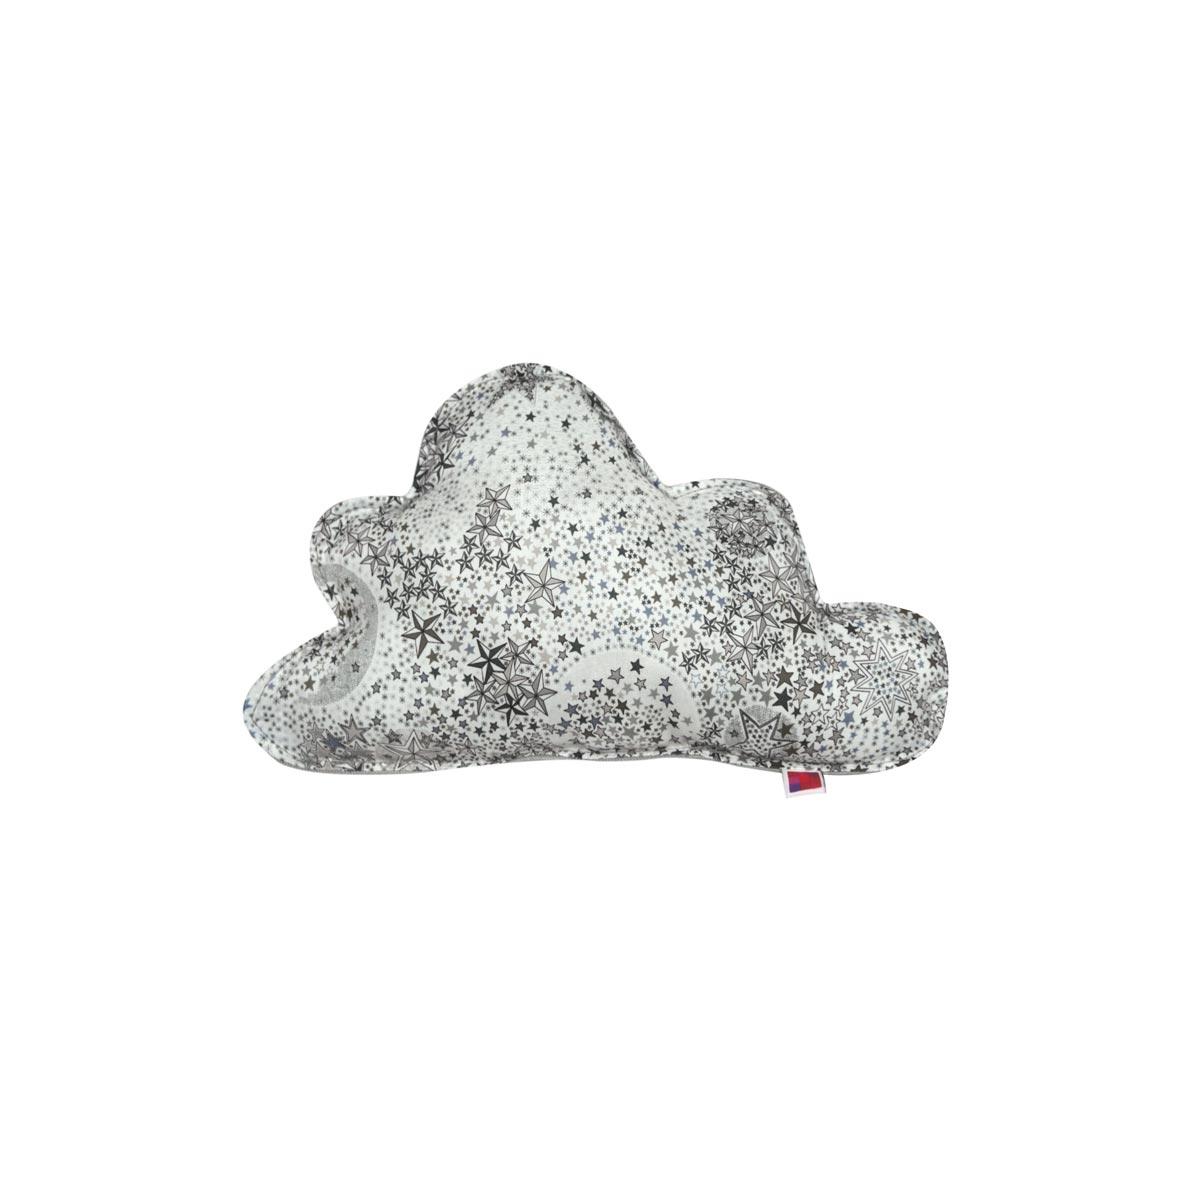 Almofada Nuvem P Tecido Liberty Adelajda Estrela 01